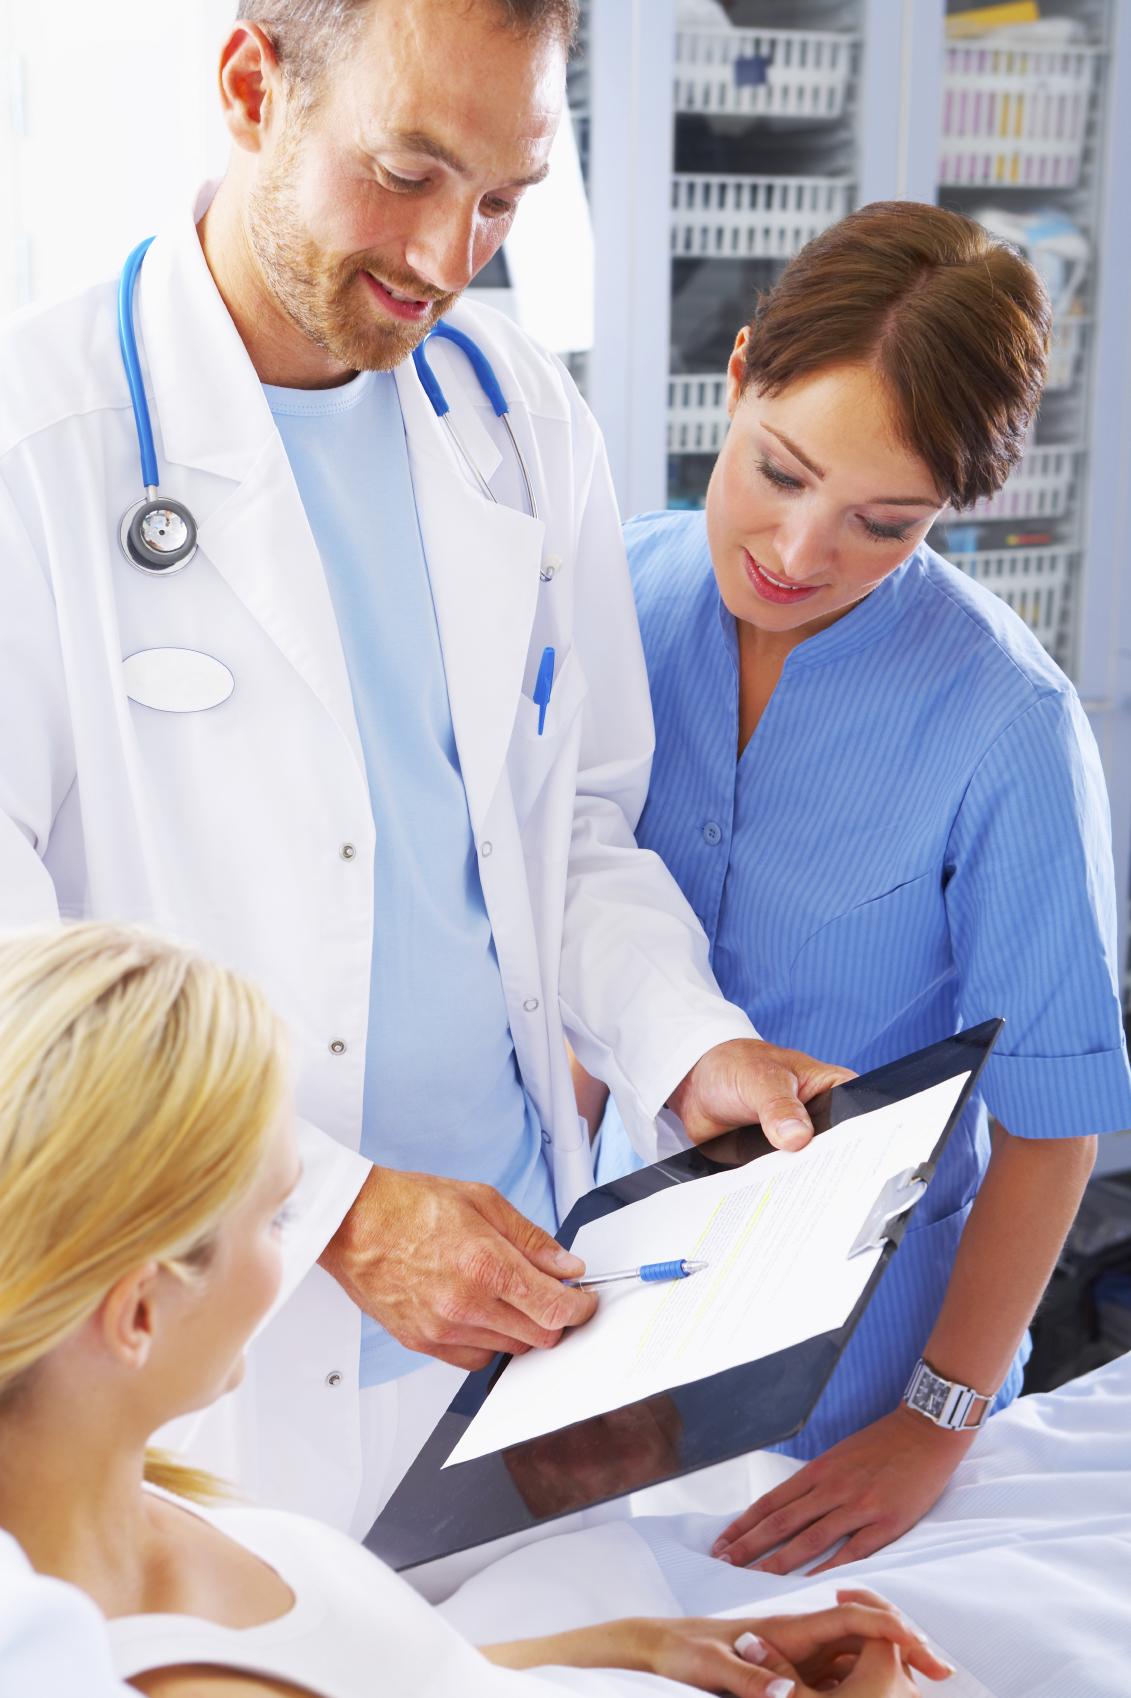 nursing-ethics-videos-dvds.jpg